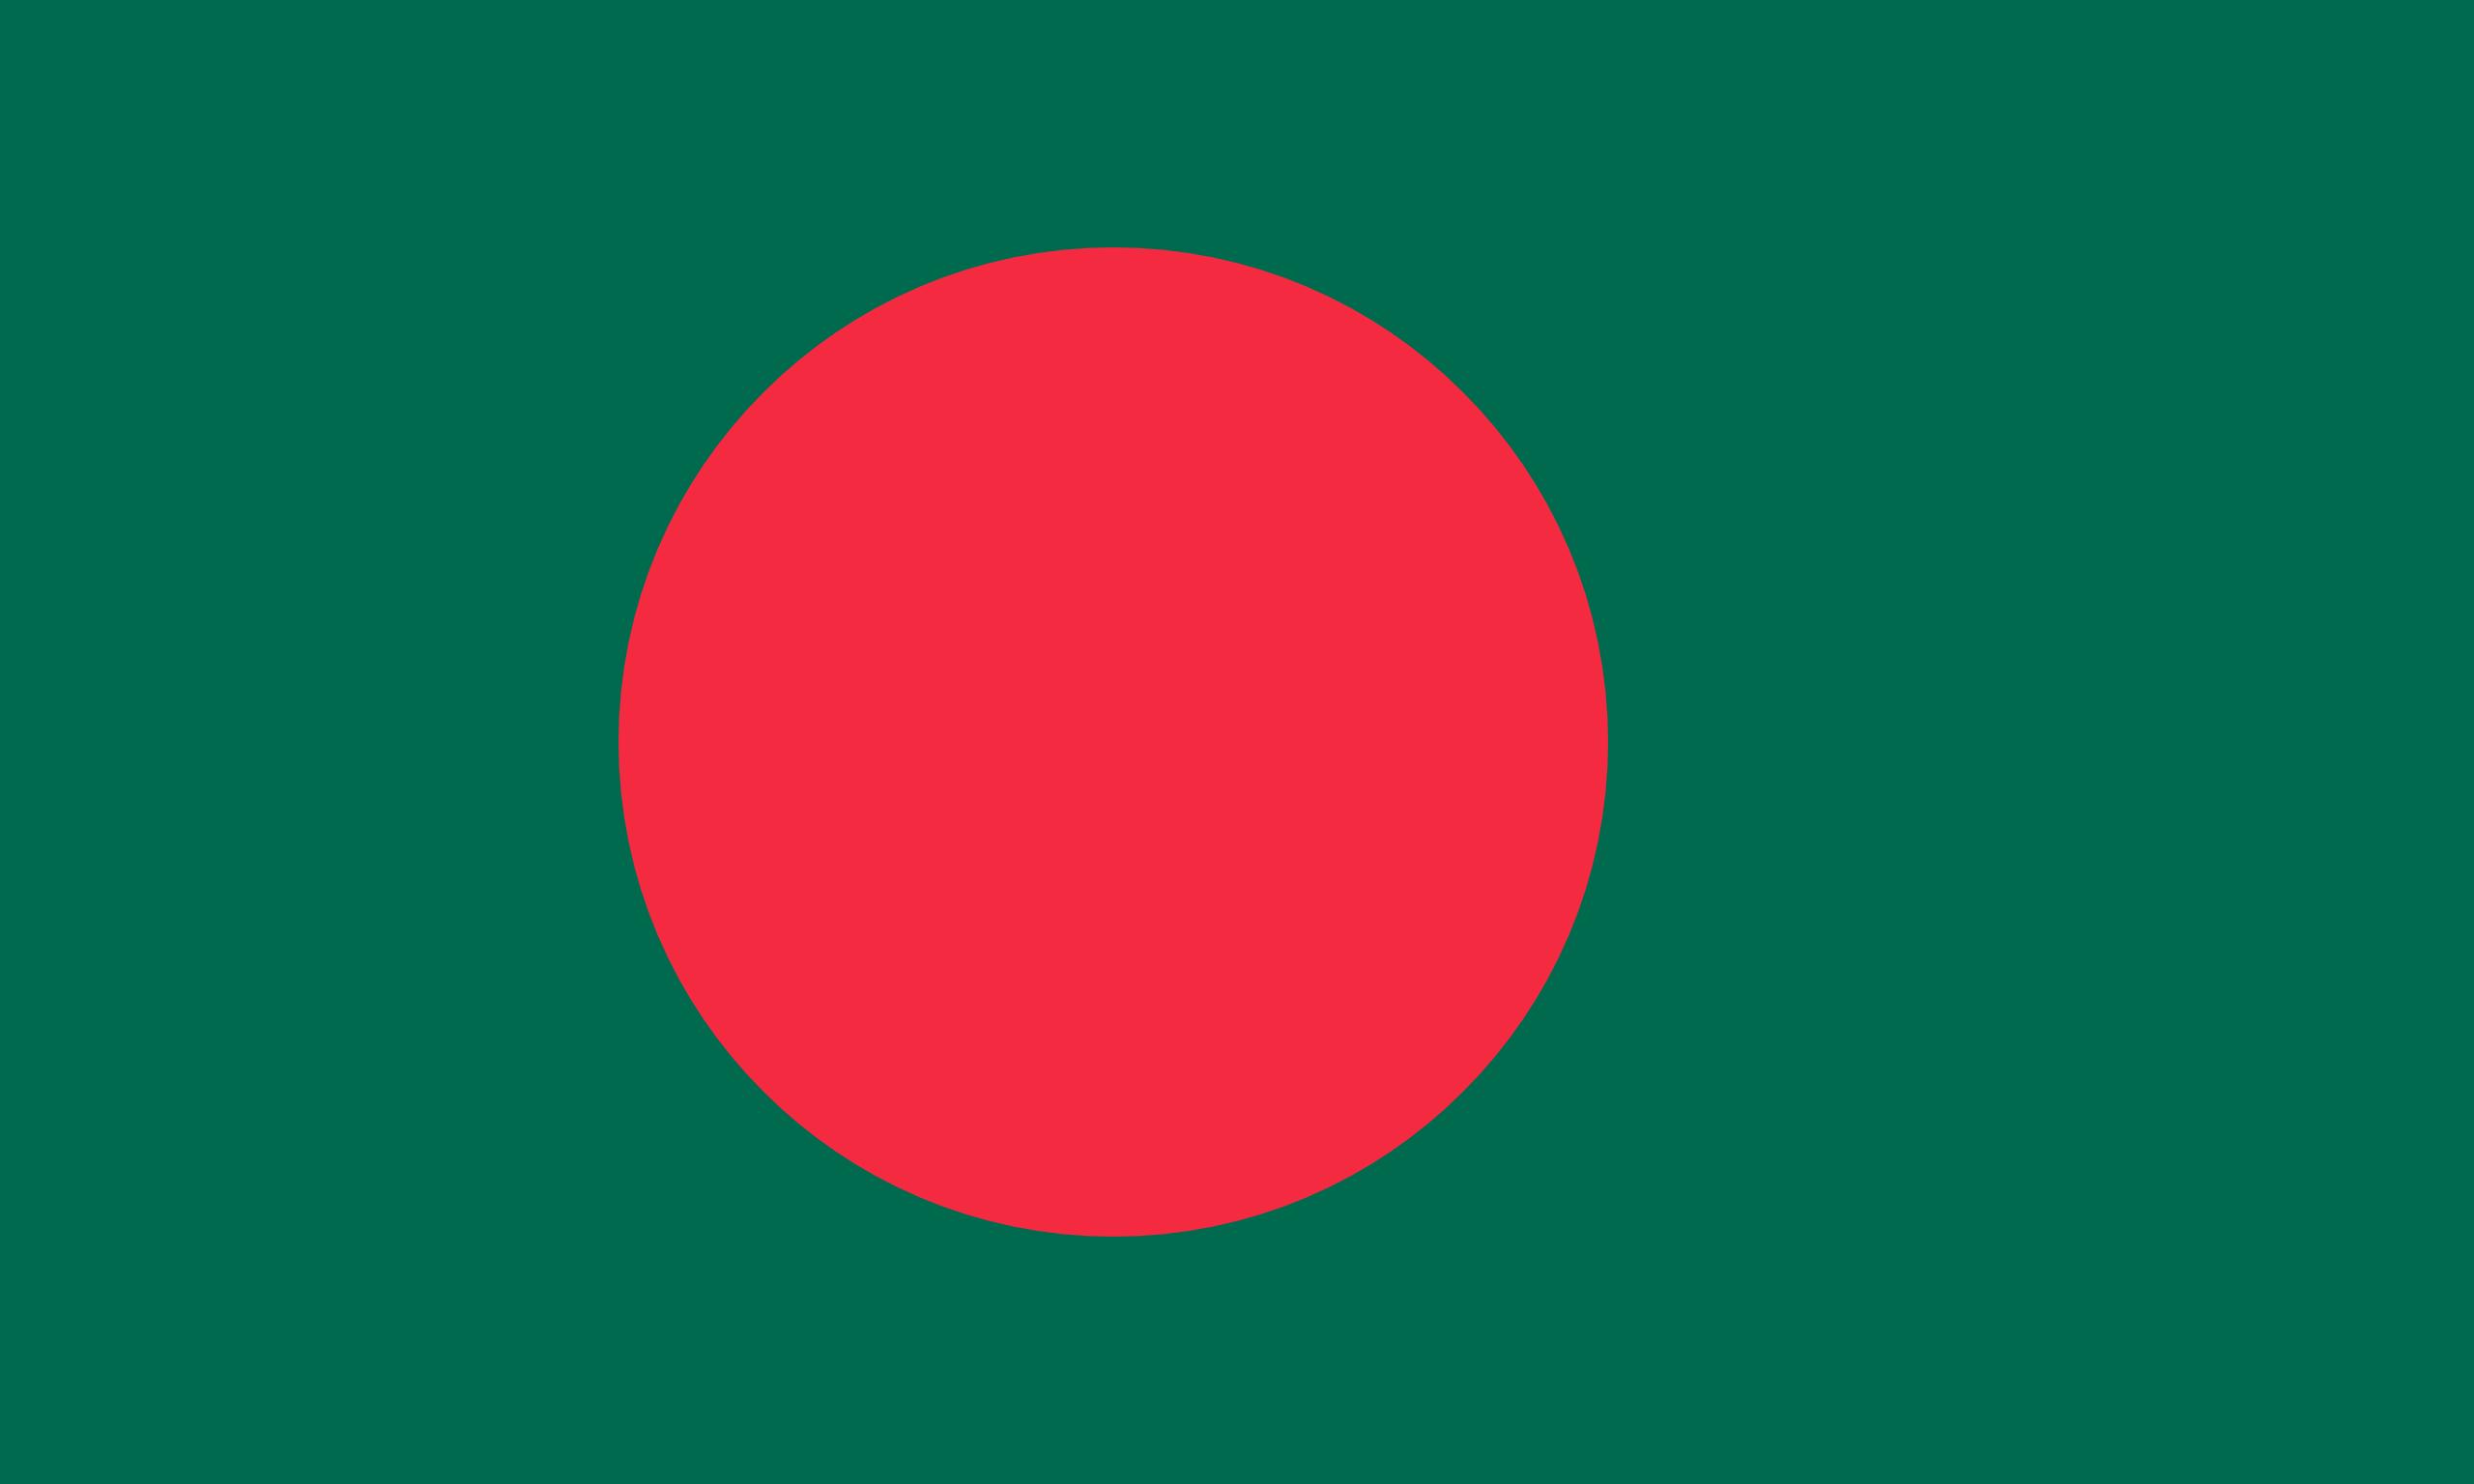 Bangladesh, paese, emblema, logo, simbolo - Sfondi HD - Professor-falken.com